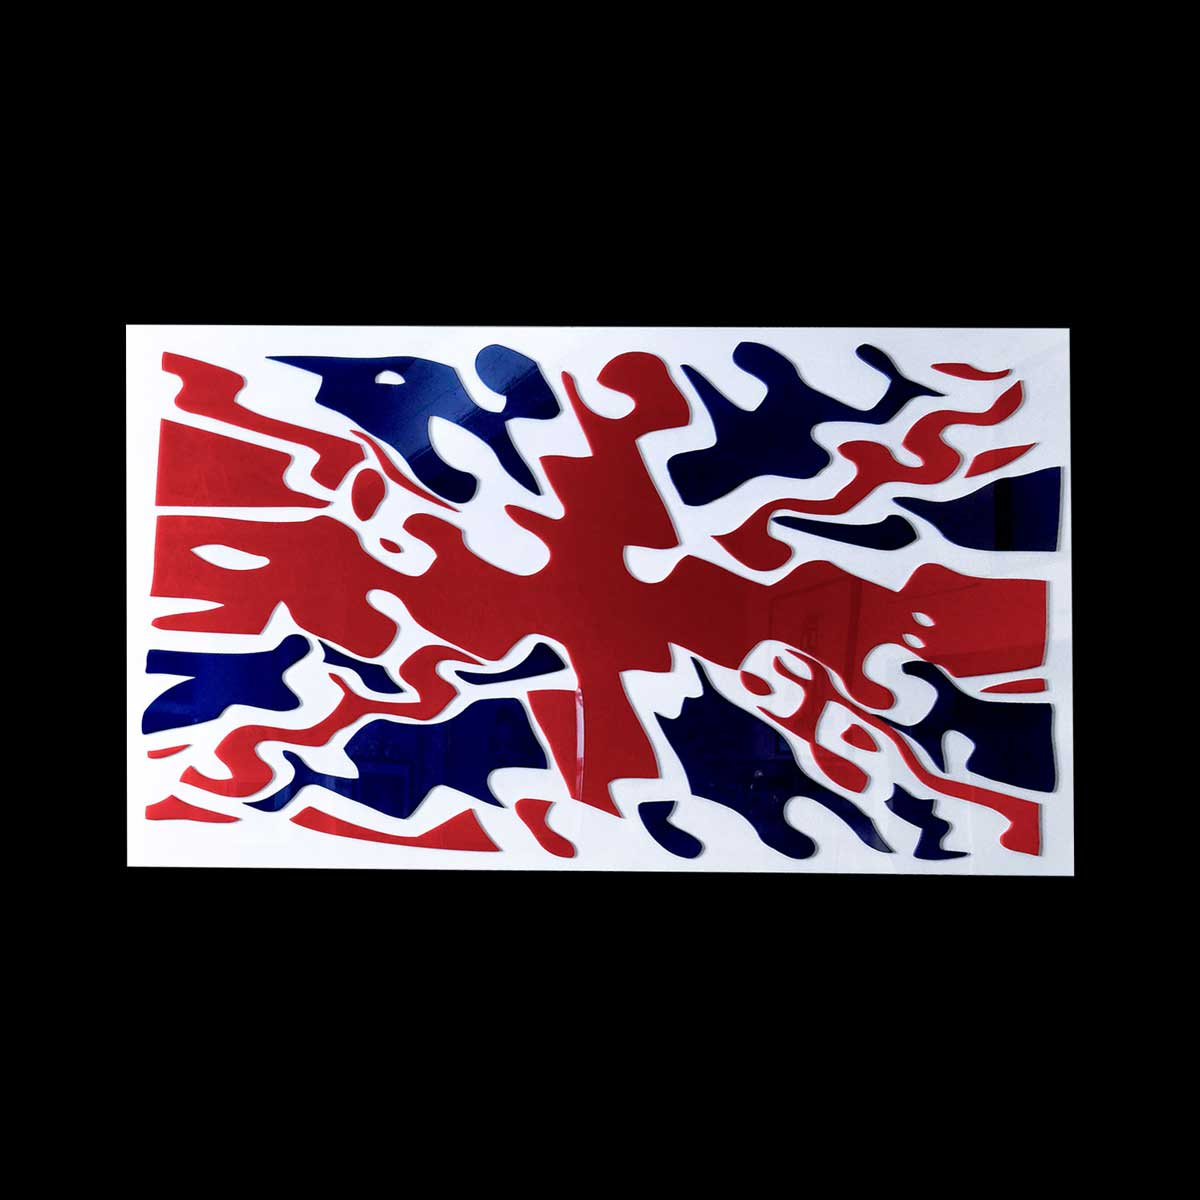 Raymond Hain,s Union Jack, 2004. Plexiglas collé sur plaque de plexiglas, cadre inox, 120 x 220 cm